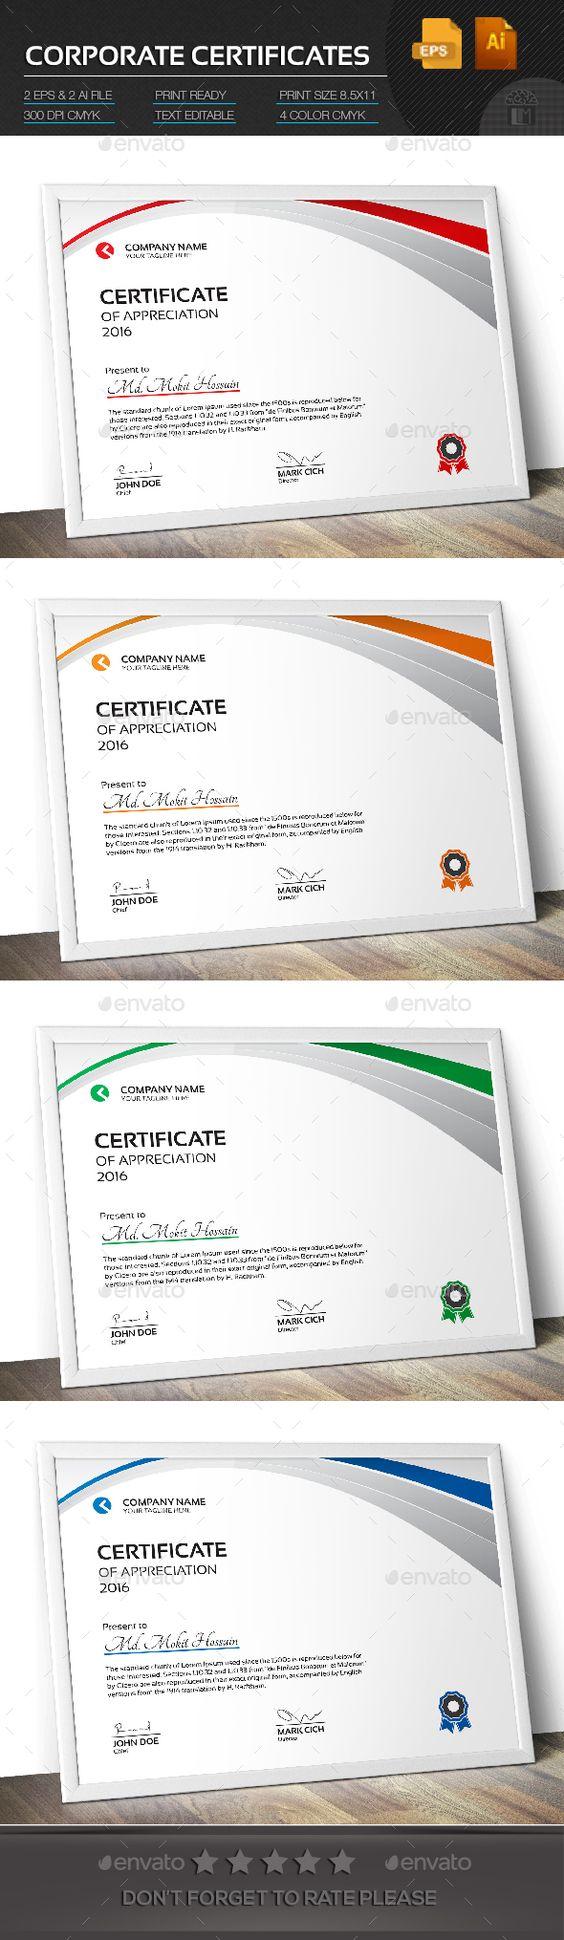 Corporate Certificate – Corporate Certificate Template